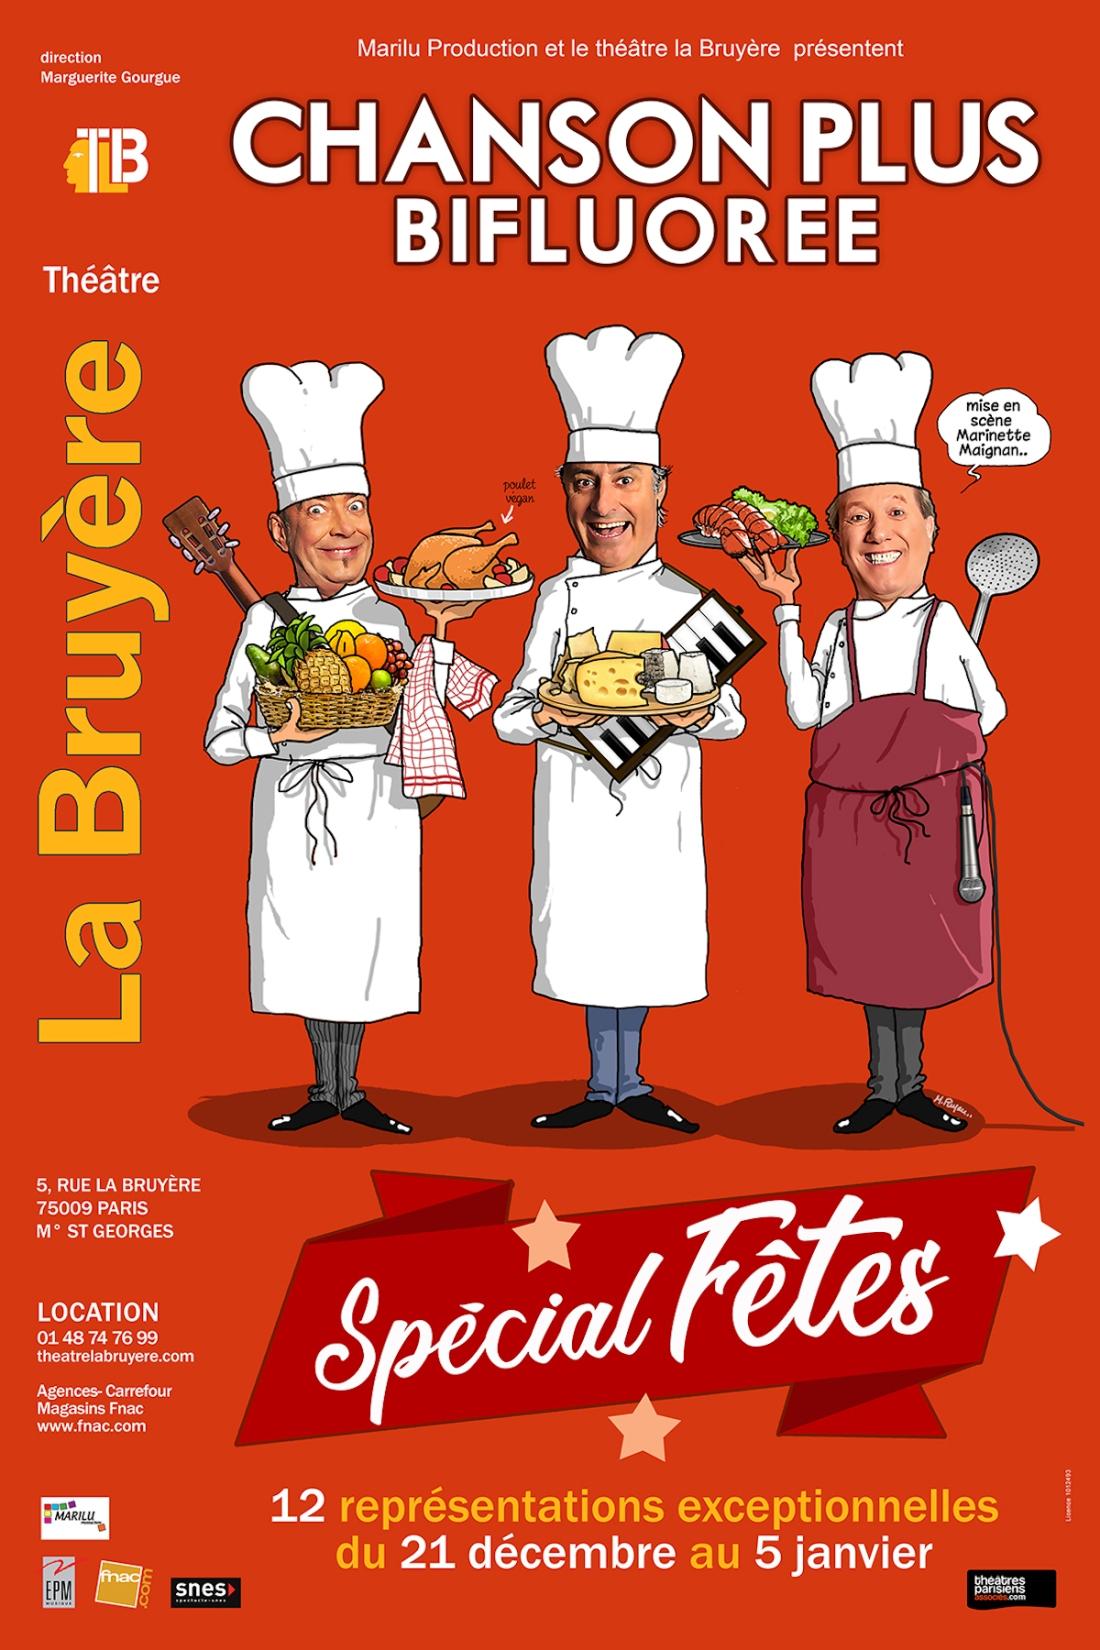 AFFICHE-SPECIAL-FETES_LA-BRUYERE-2019_SITE-MARILU